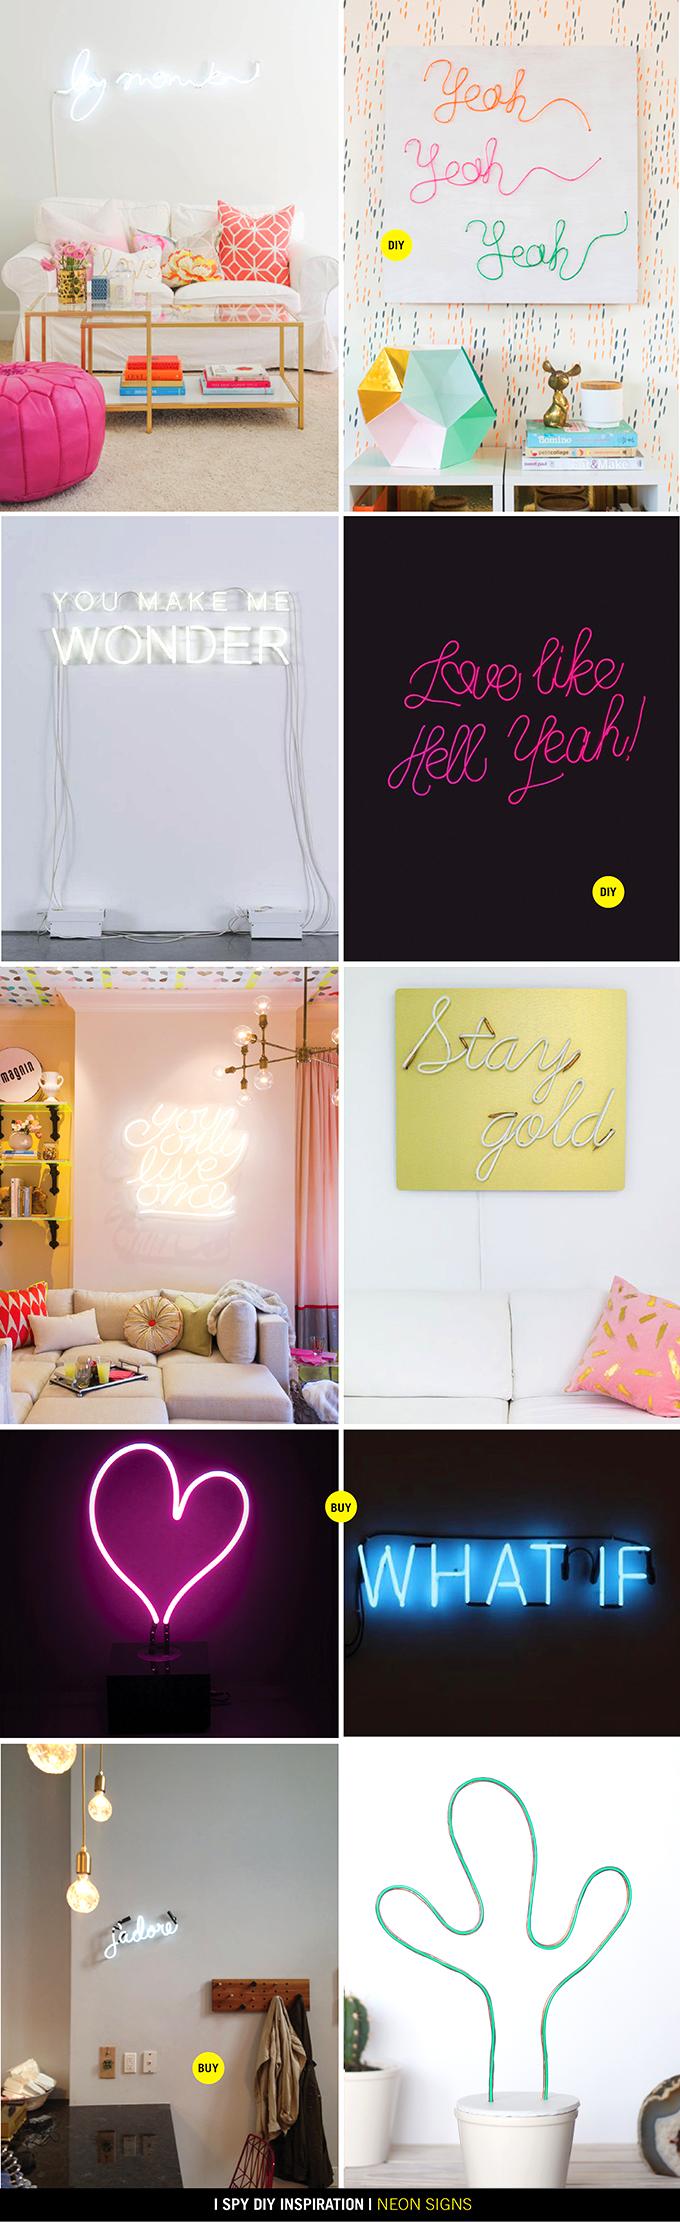 DIY INSPIRATION   Neon Signs   I Spy DIY   Bloglovin'